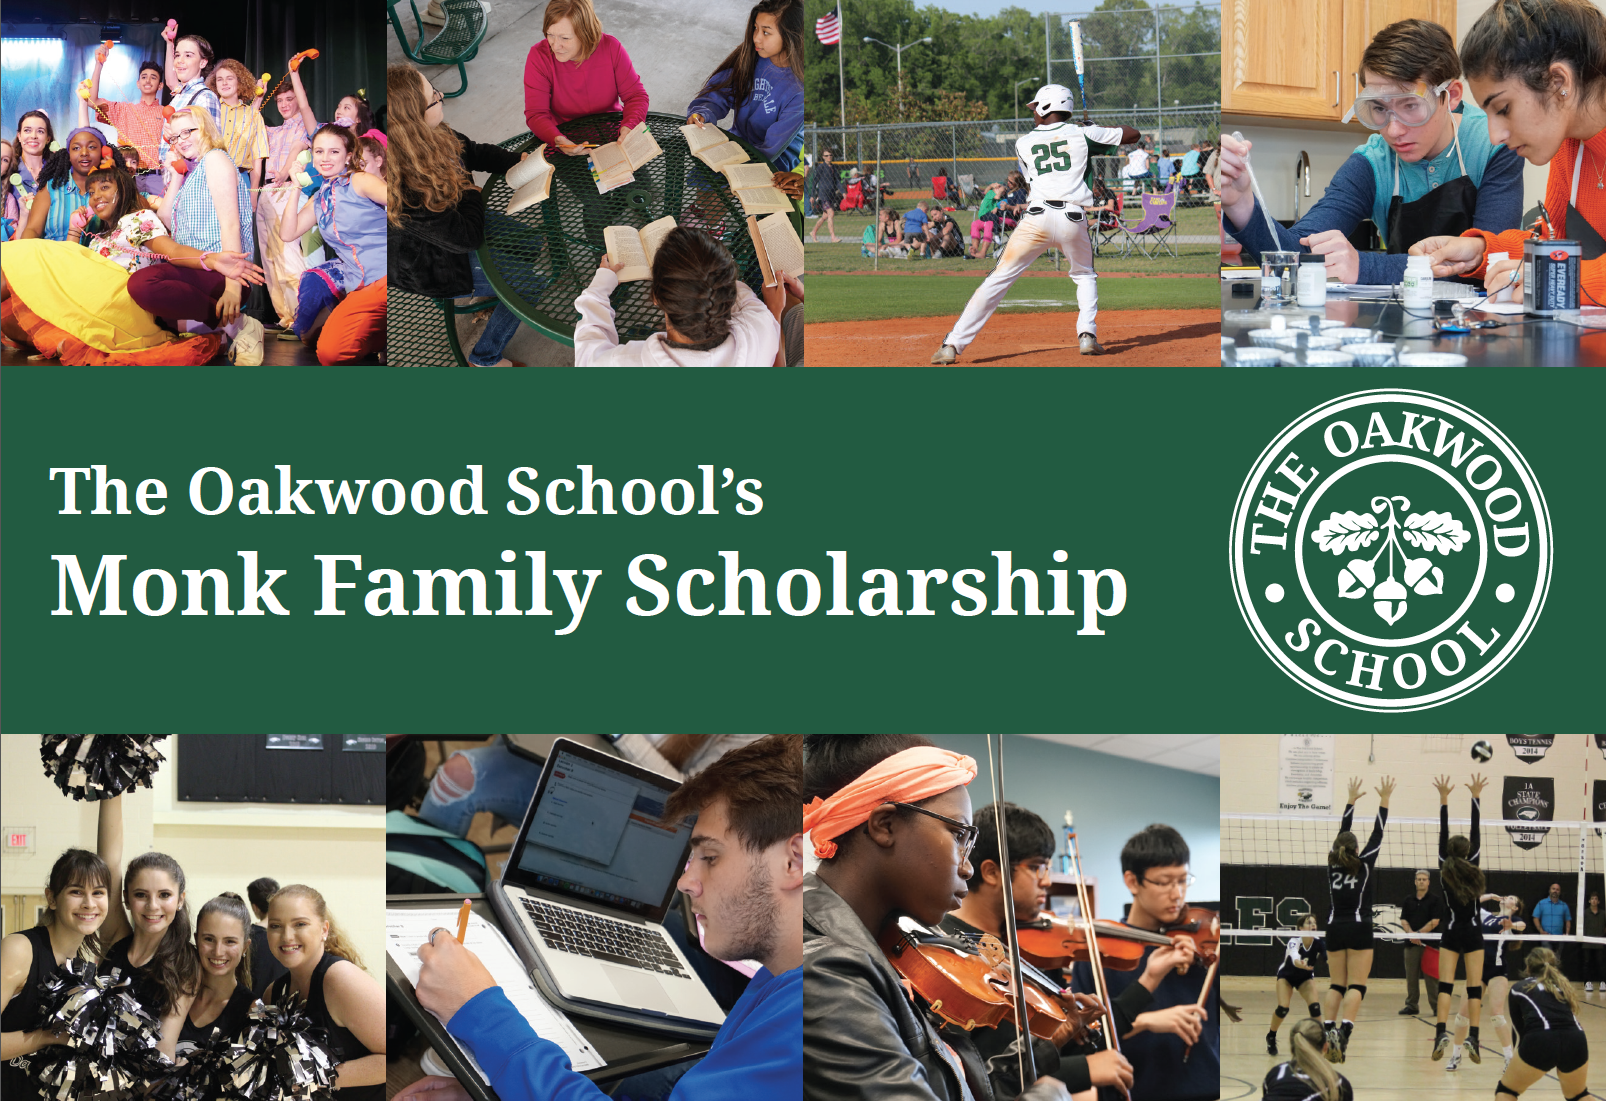 Monk Family Scholarship - The Oakwood School